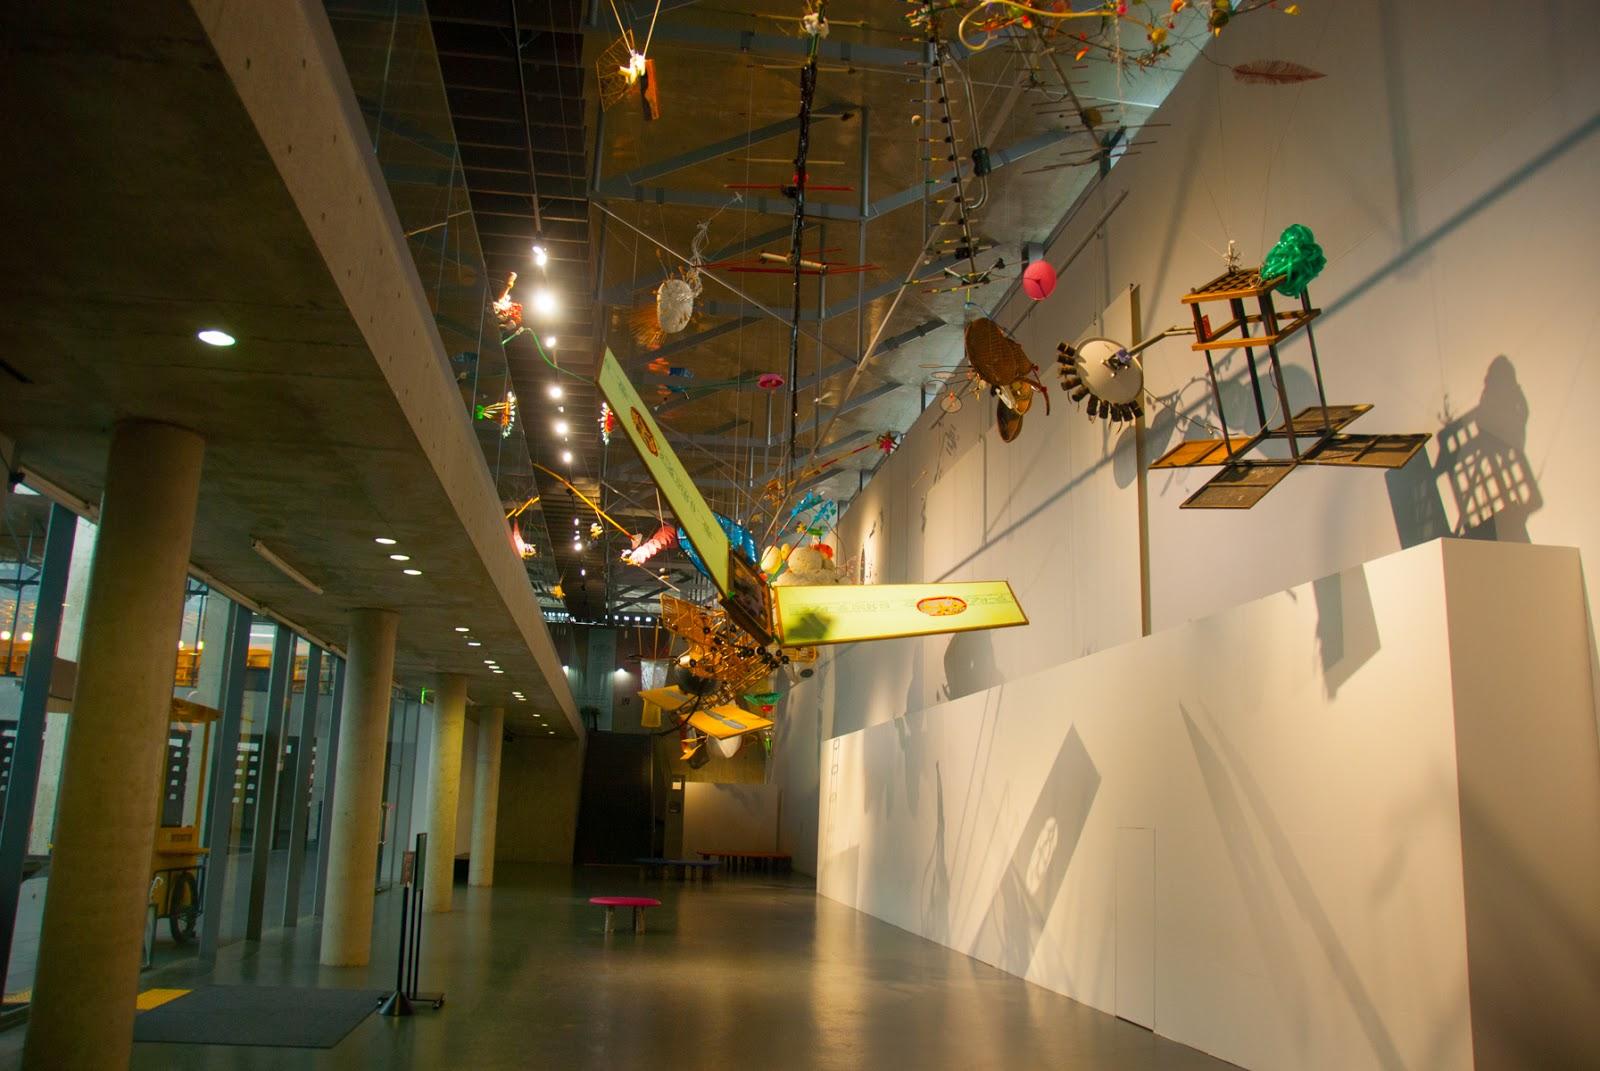 越後妻有里山現代美術館 キナーレ 展示